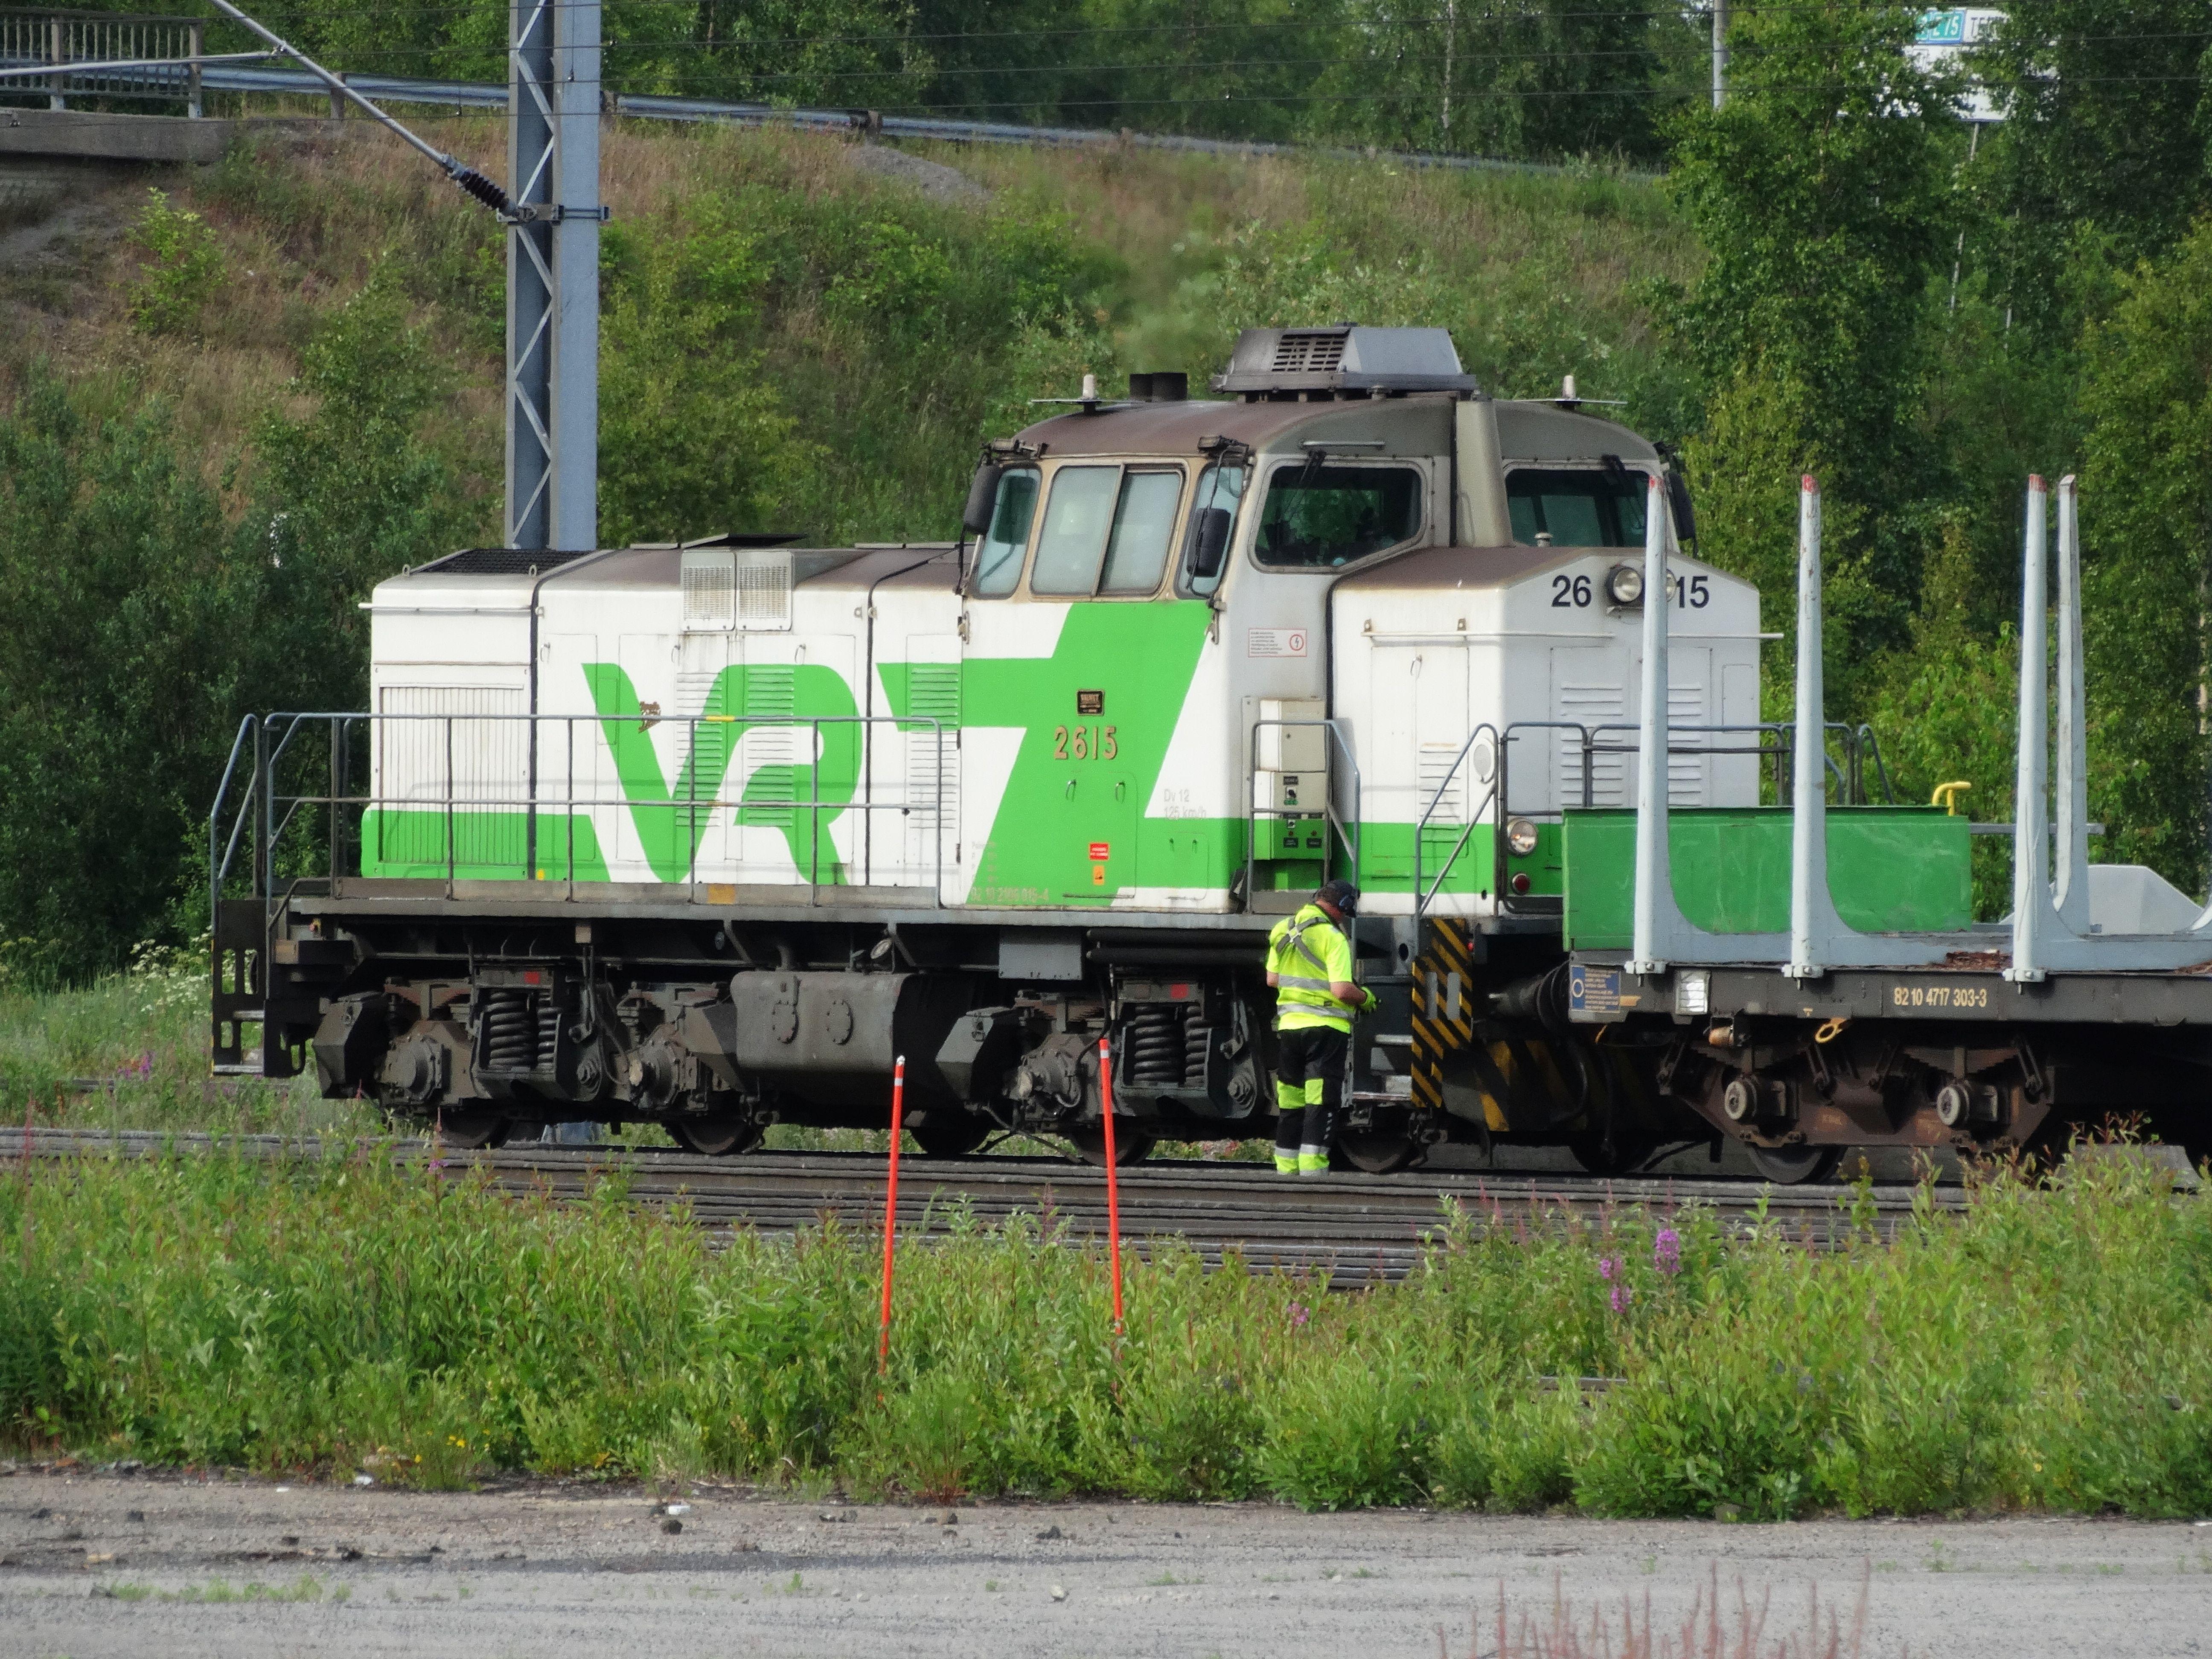 FUNET Railway Photography Archive: Finland - diesel locomotives